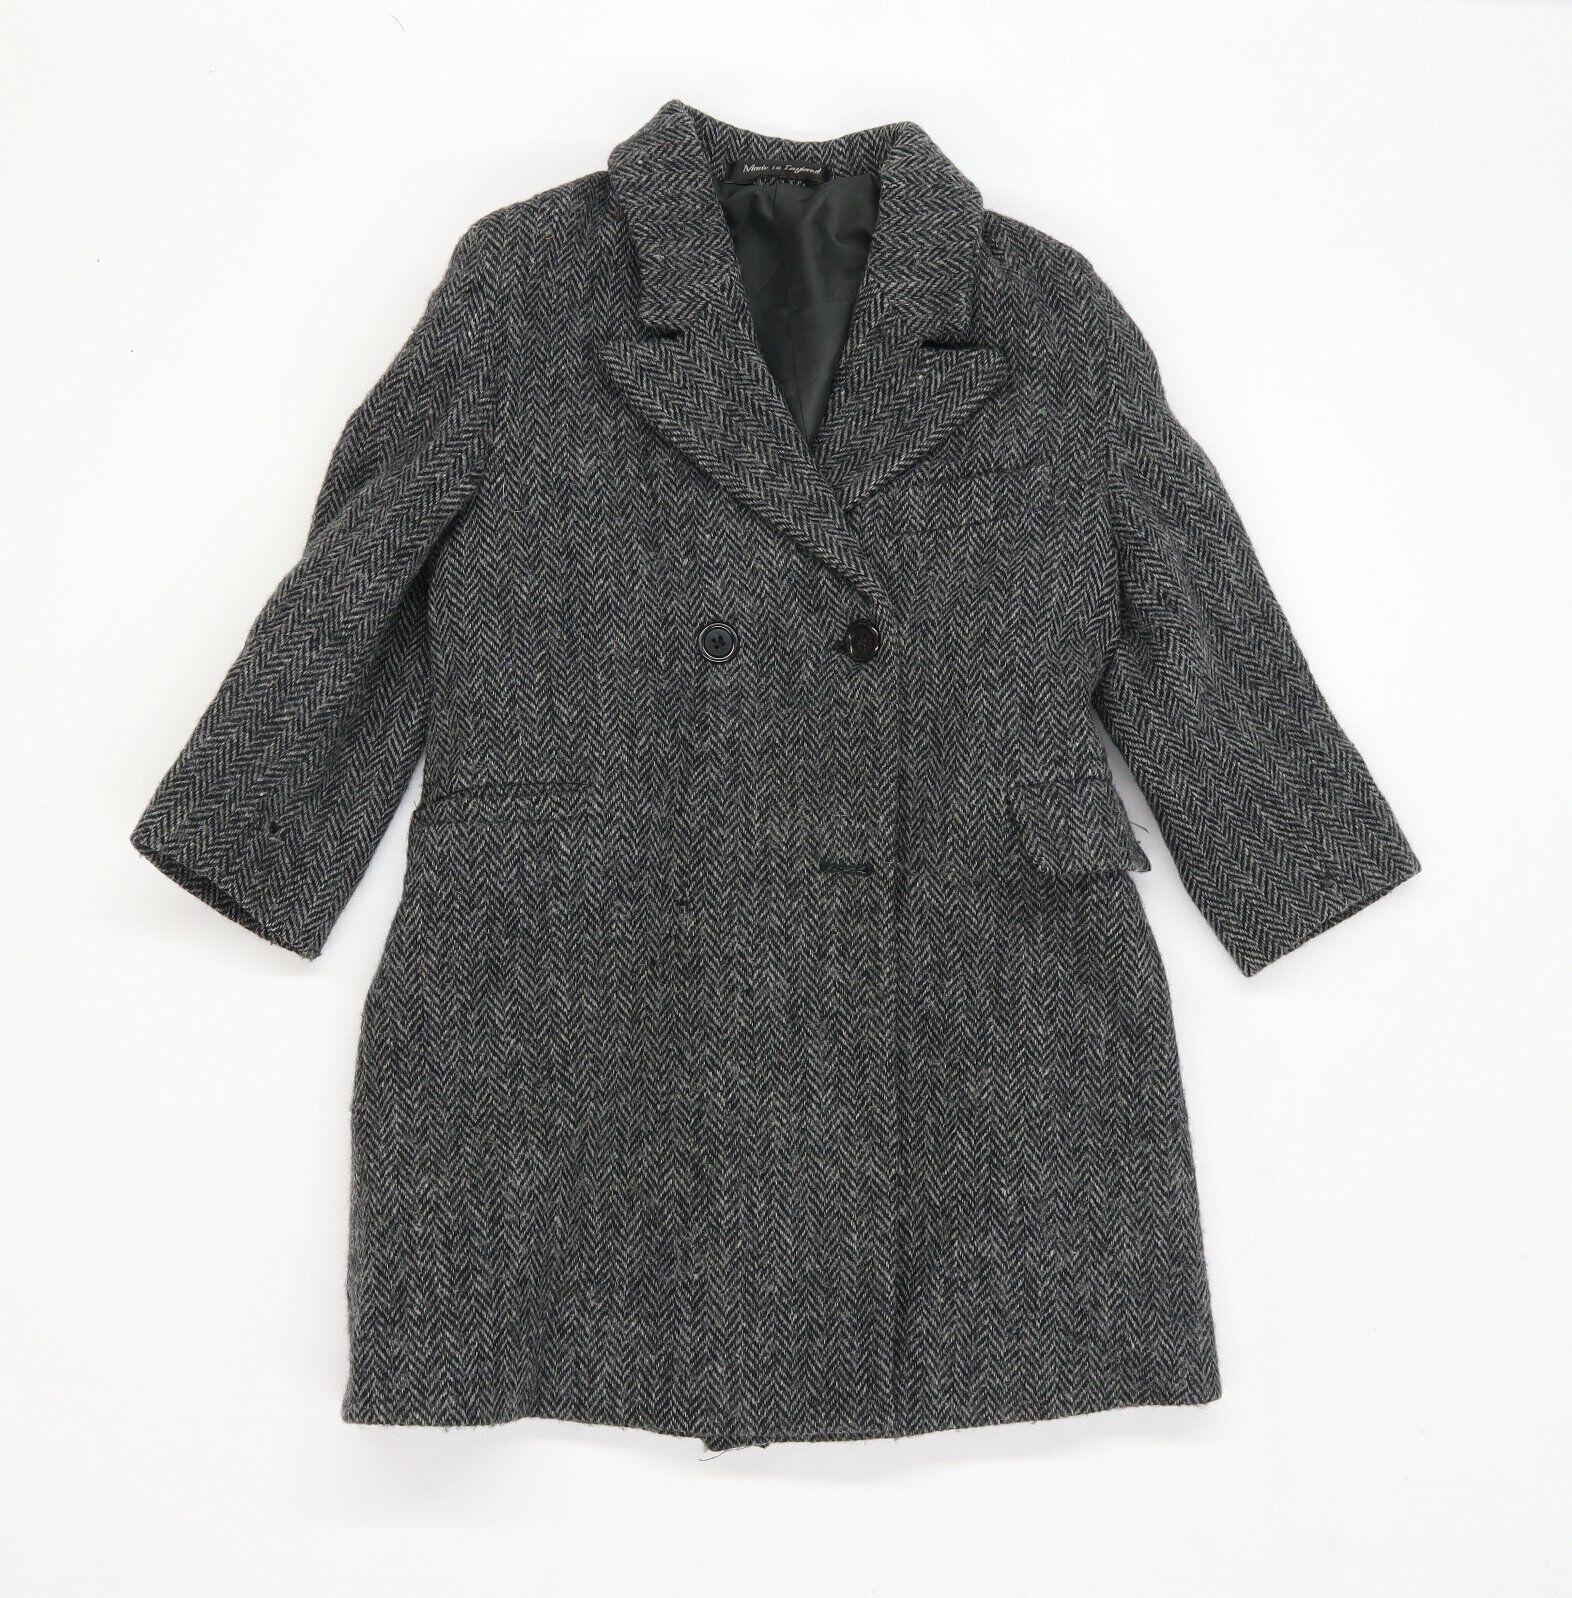 Preworn Womens Grey Overcoat Jacket Size 2